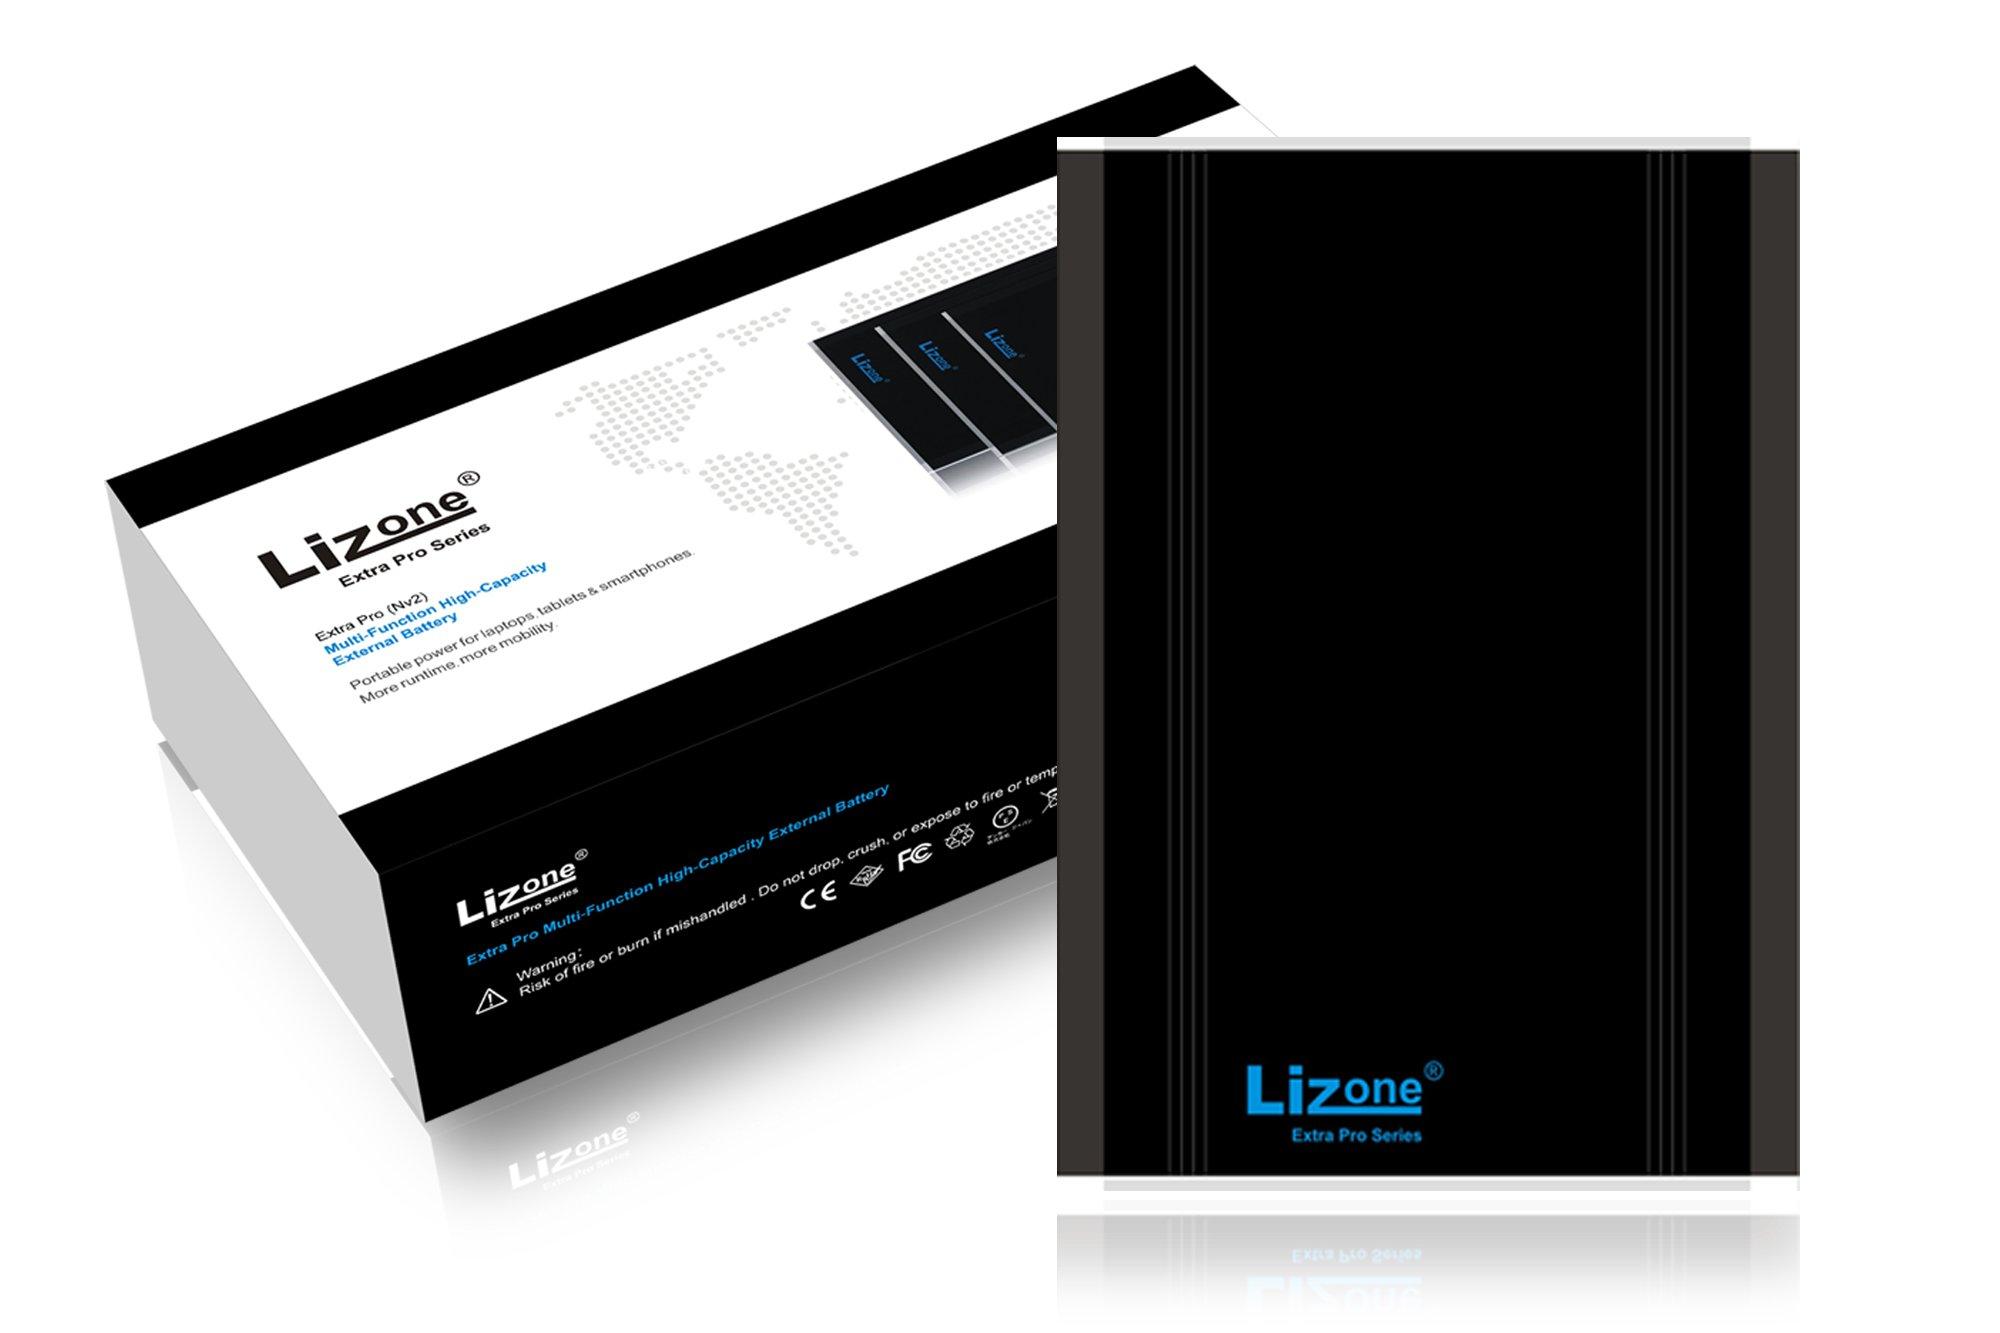 Lizone Extra Pro 40000mAh Laptop Portable External Battery Power Bank for IBM Lenovo ThinkPad IdeaPad Yoga Pro Flex Helix Carbon Ultrabook; USB Charger for Tablet or smartphones (40000mAh)